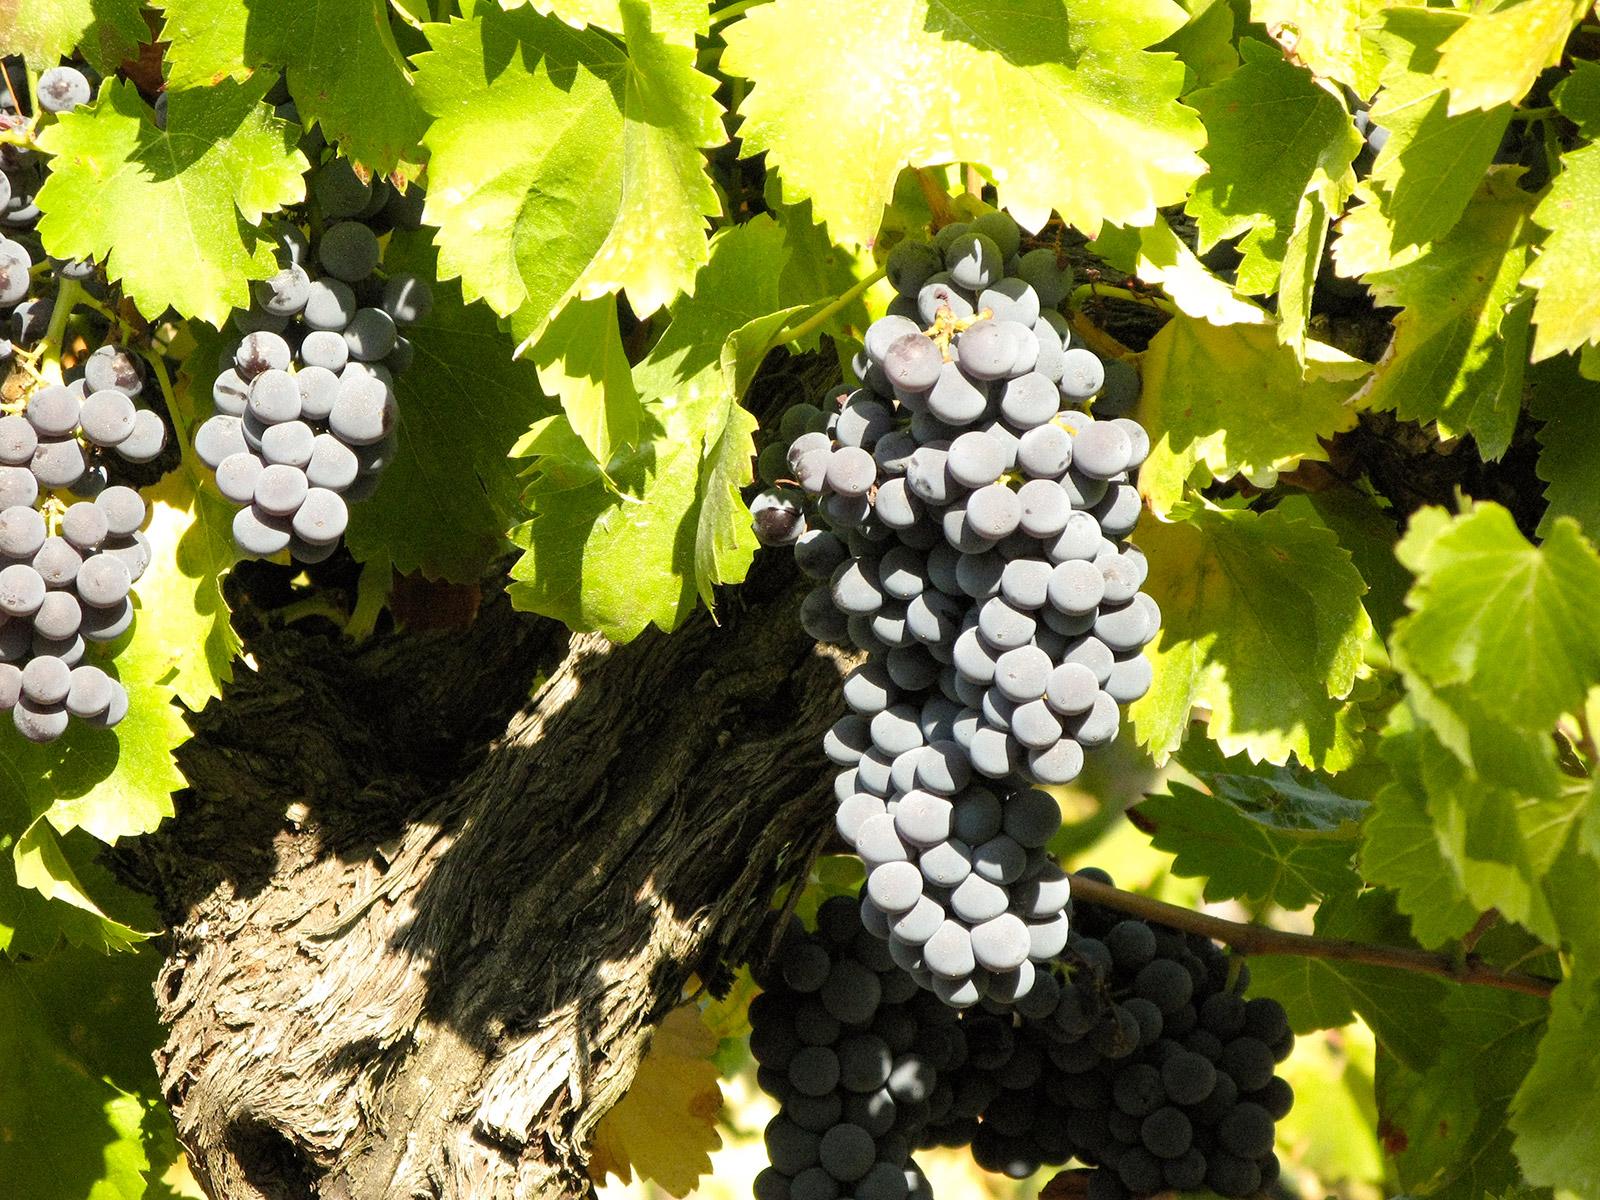 D'Abrigeon œnologie conseils – Œnologue - Gard – Hérault - Vaucluse – Bouches-du-Rhône